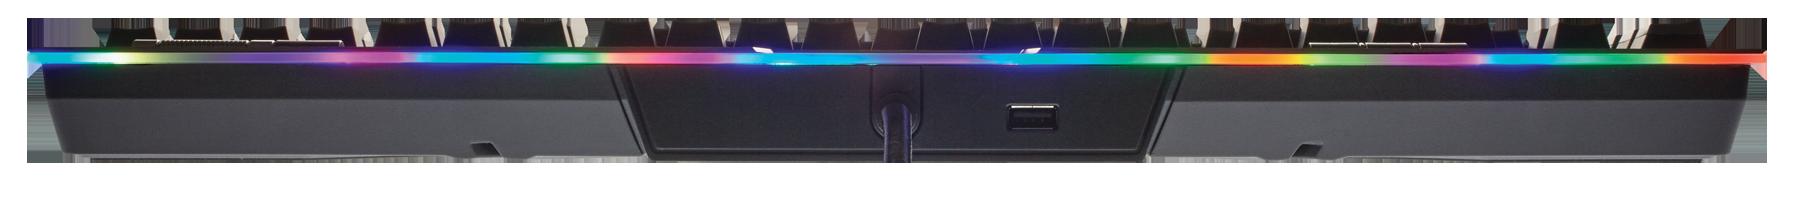 Corsair K95 RGB Platinum 2